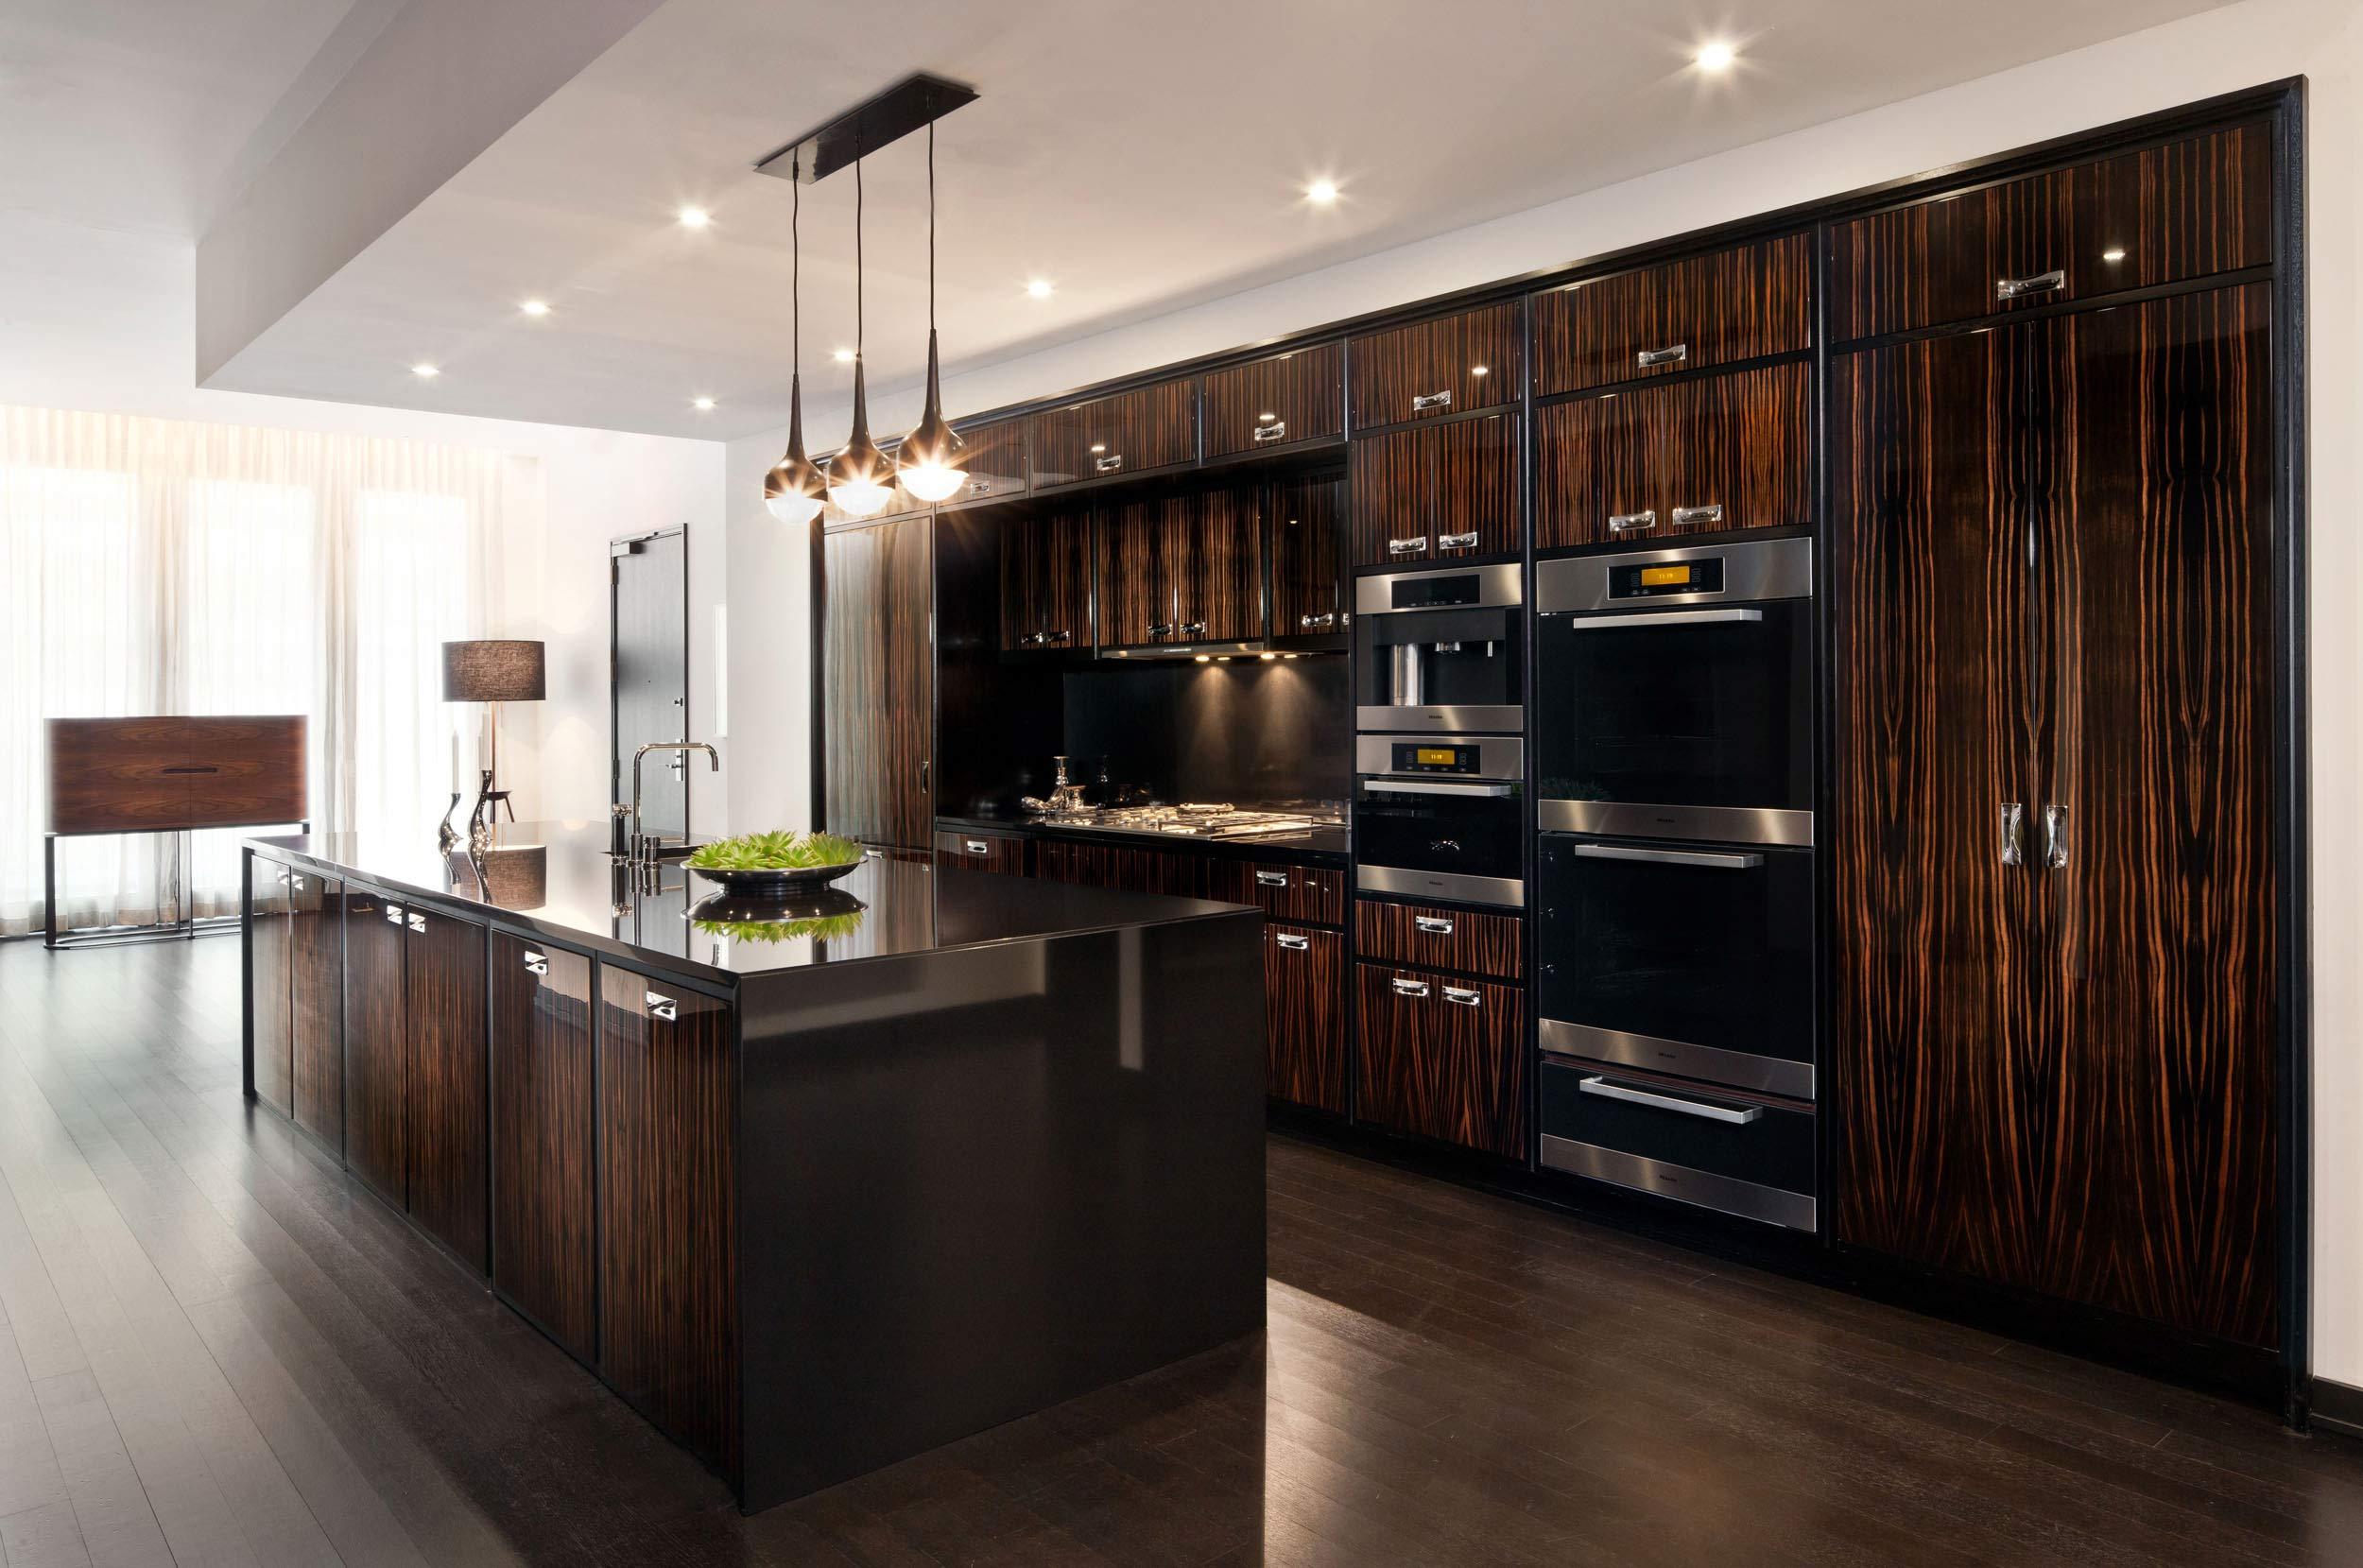 Existing-kitchen.jpg